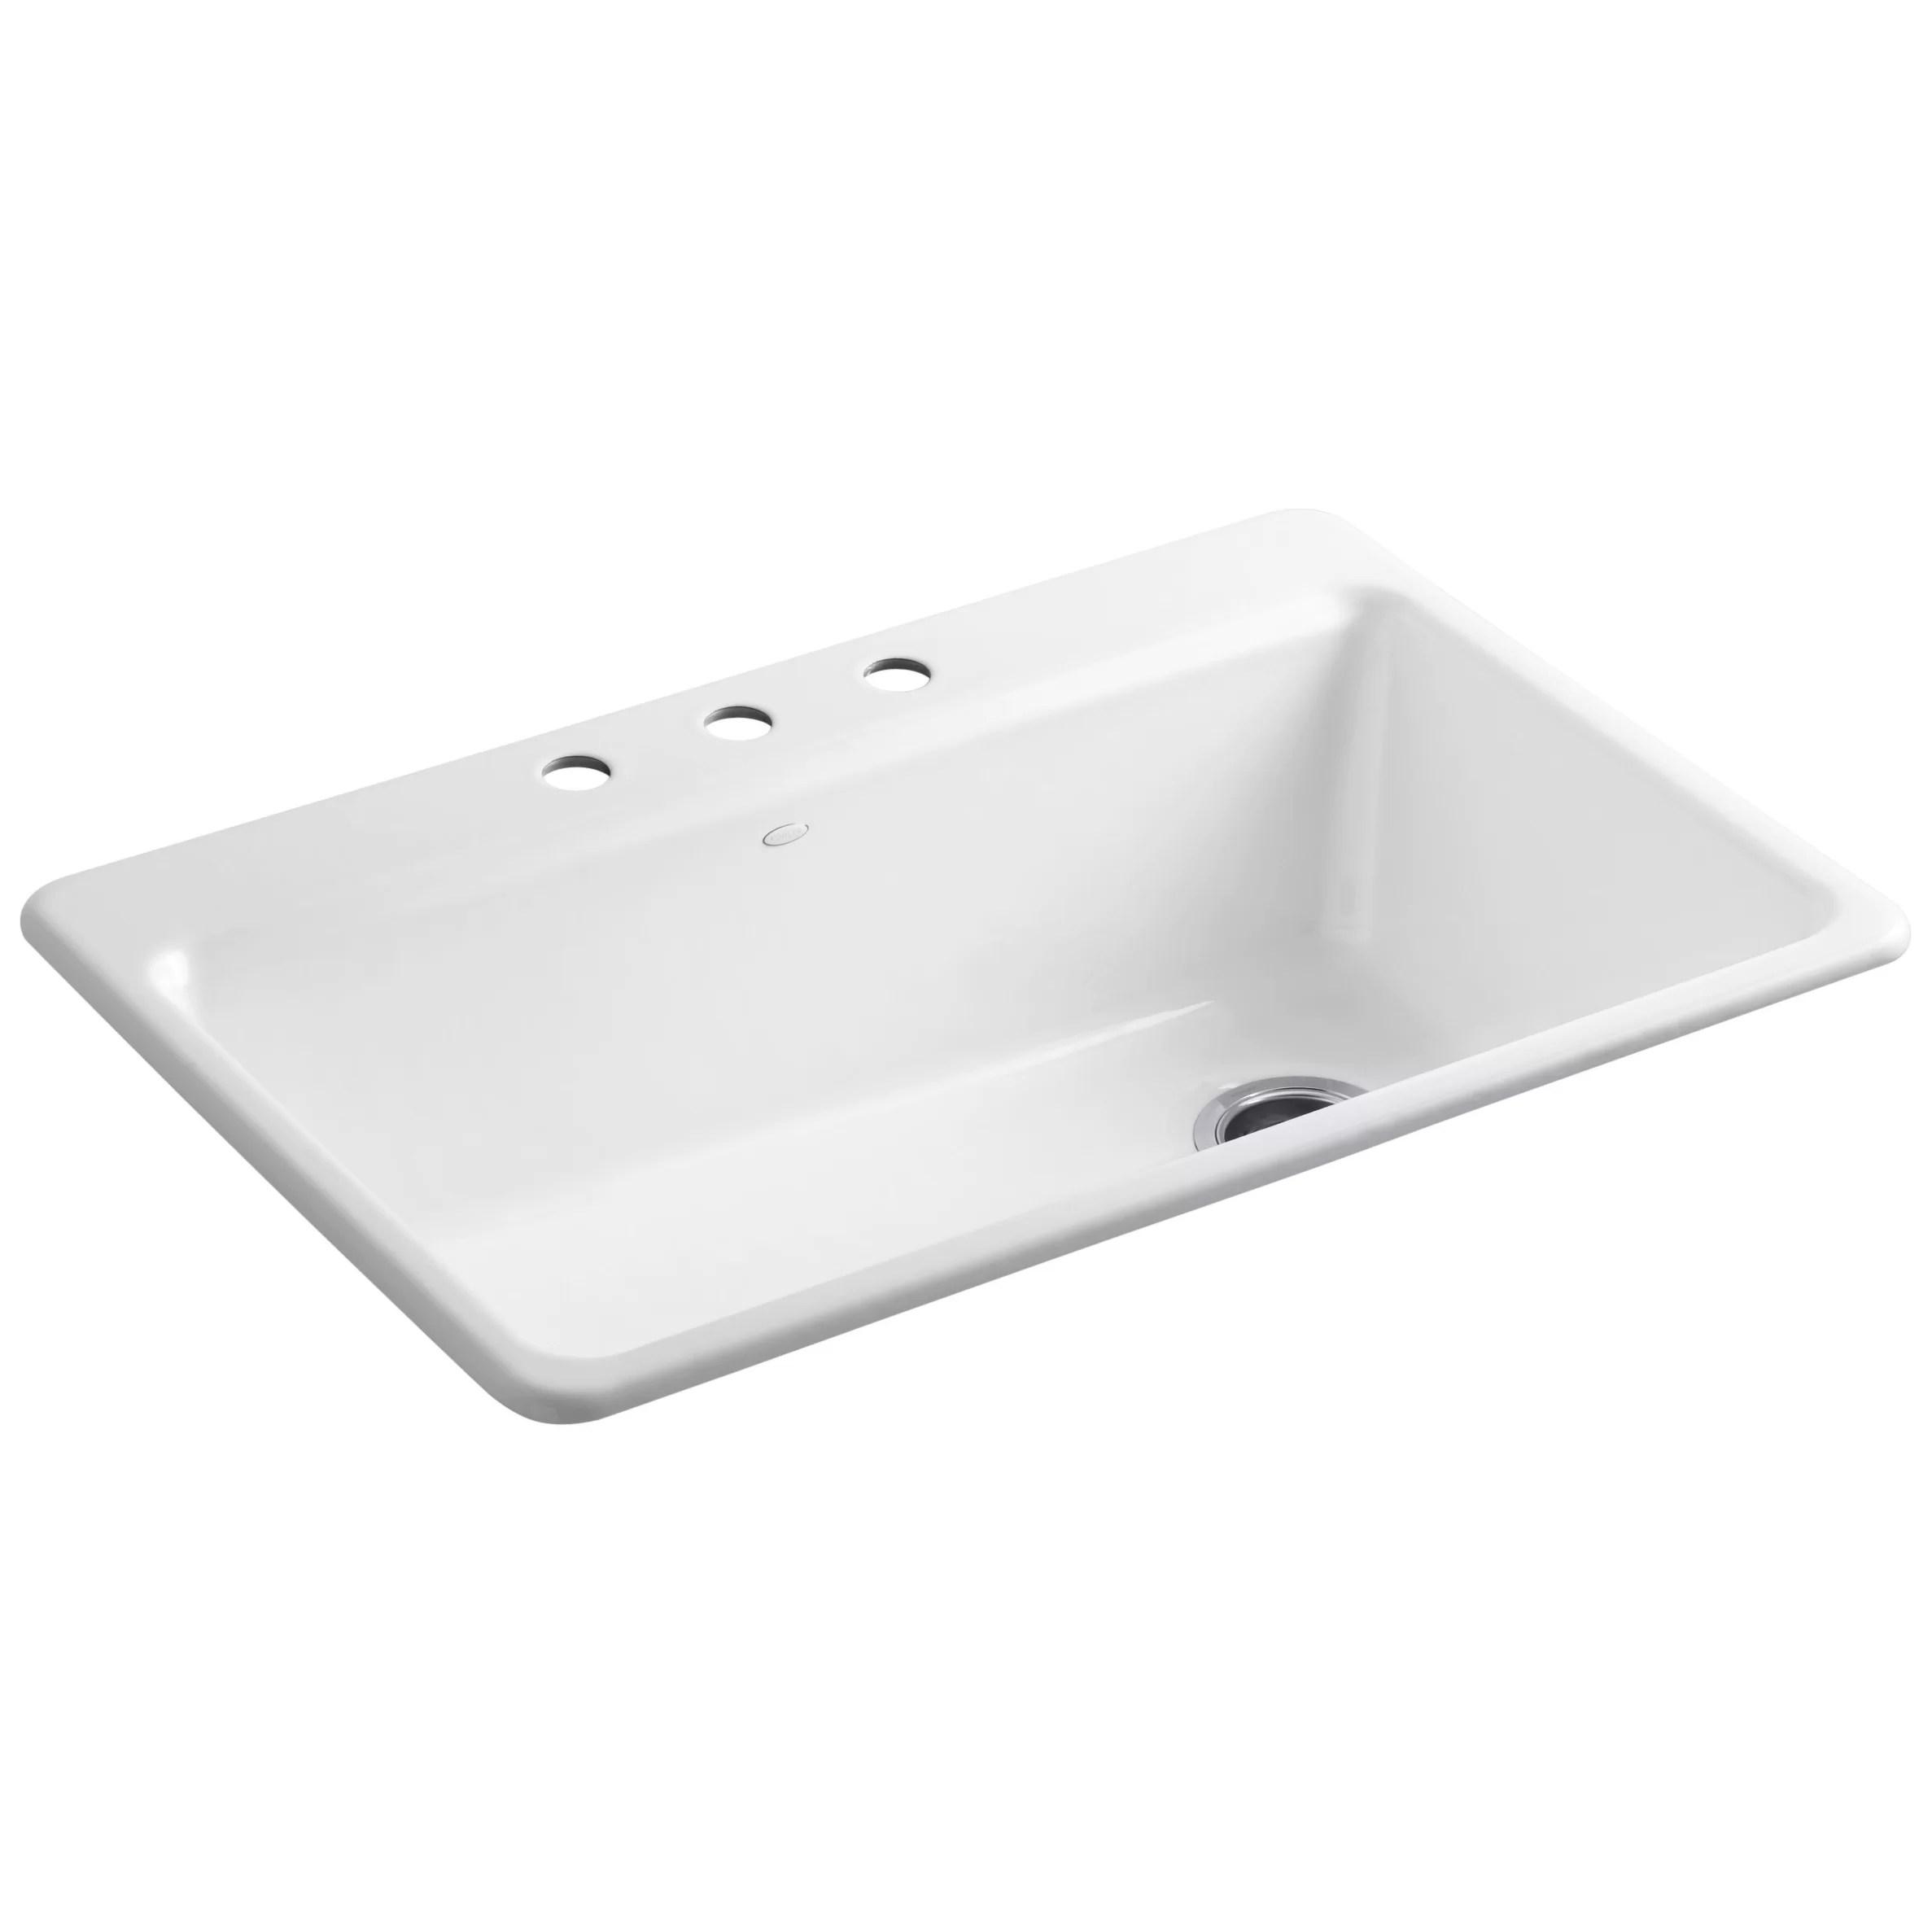 kohler kitchen sink accessories and bath design center riverby 33 quot x 22 9 5 8 top mount single bowl